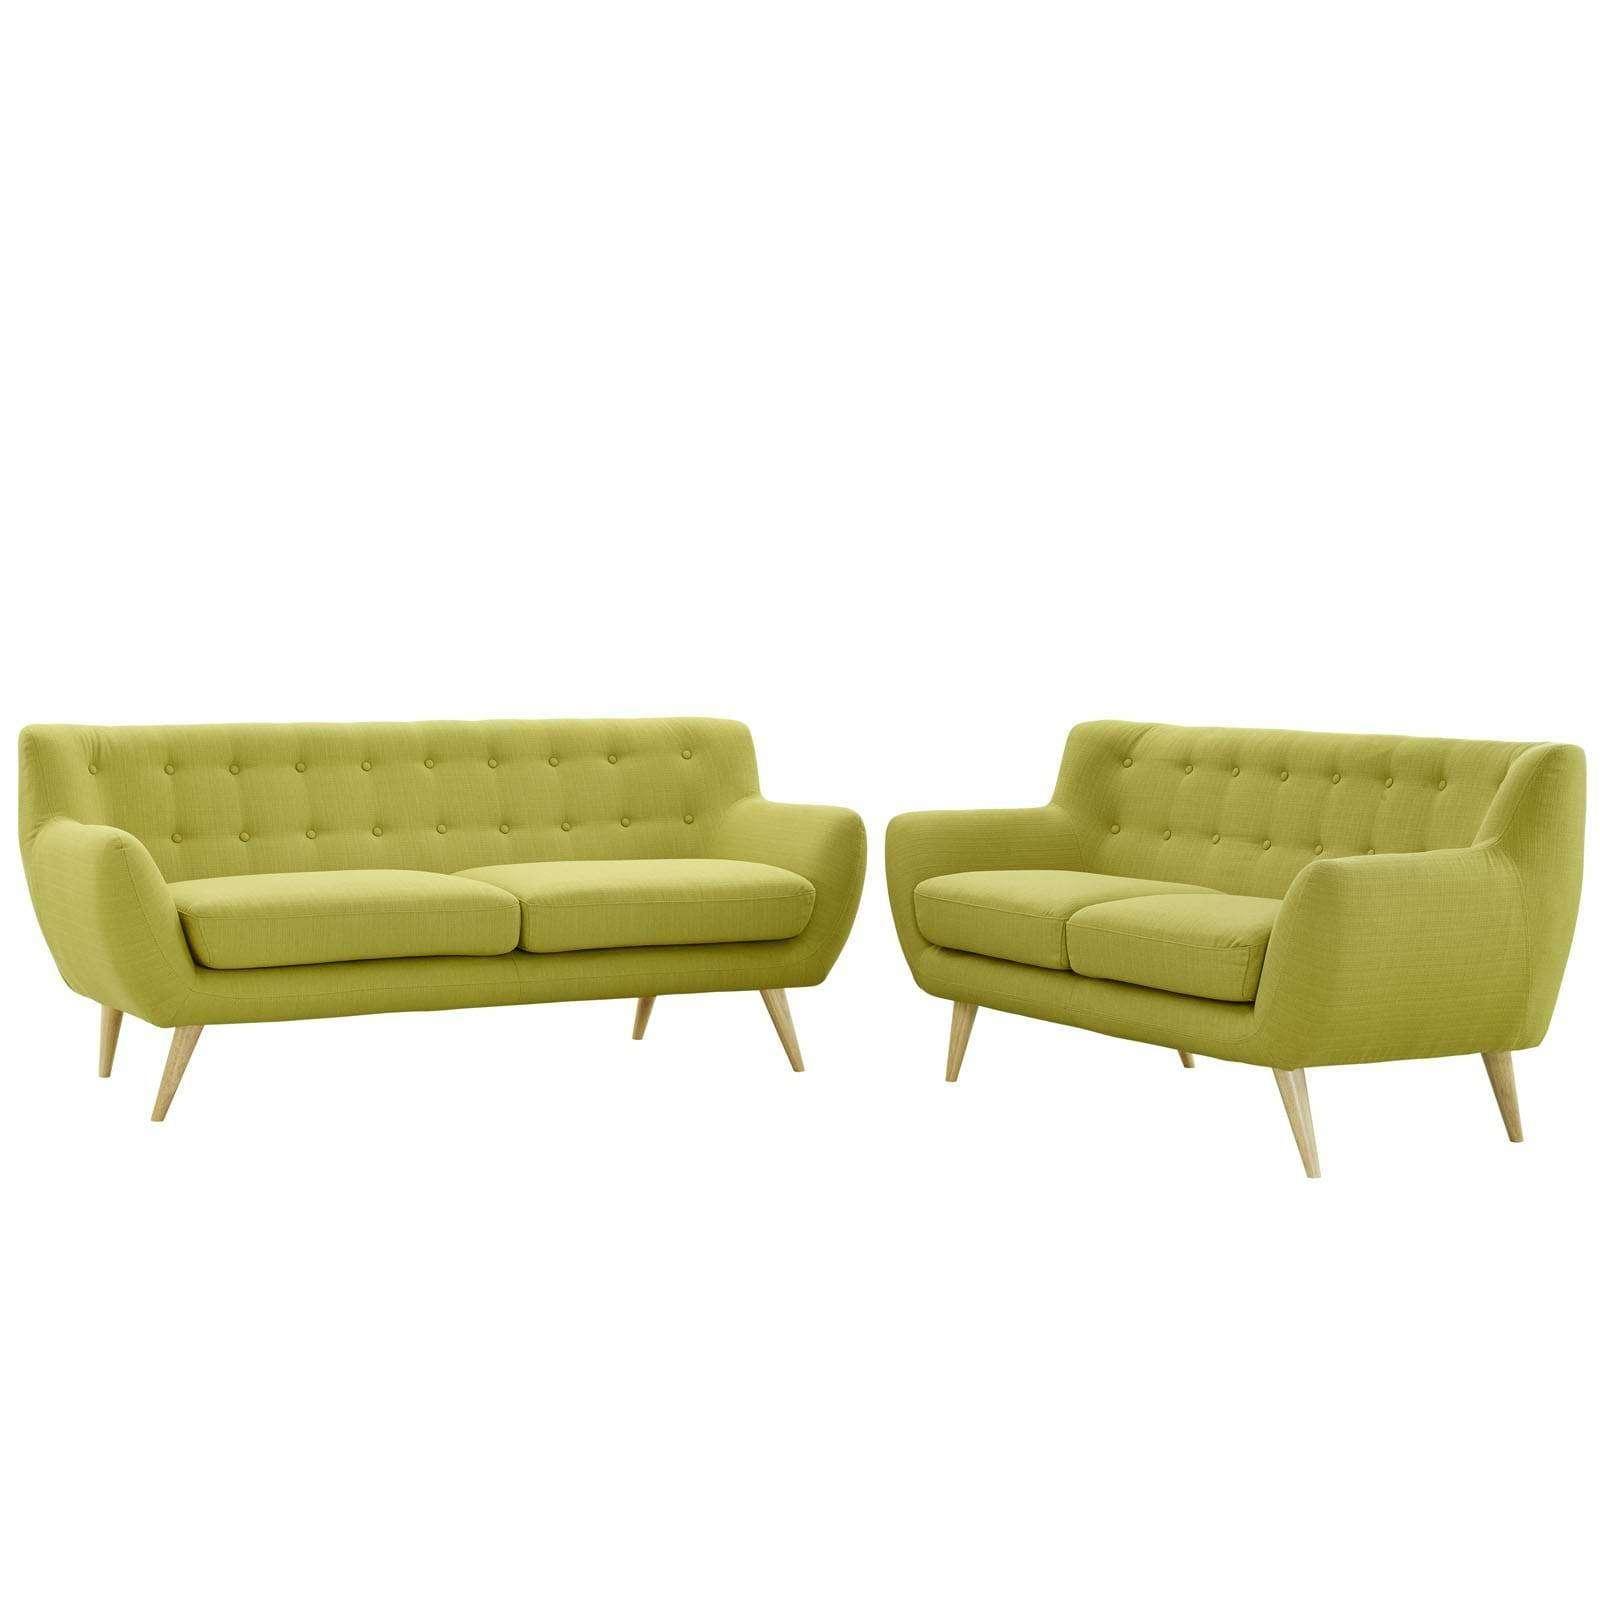 Remark living room set 2 piece for 2 piece living room set